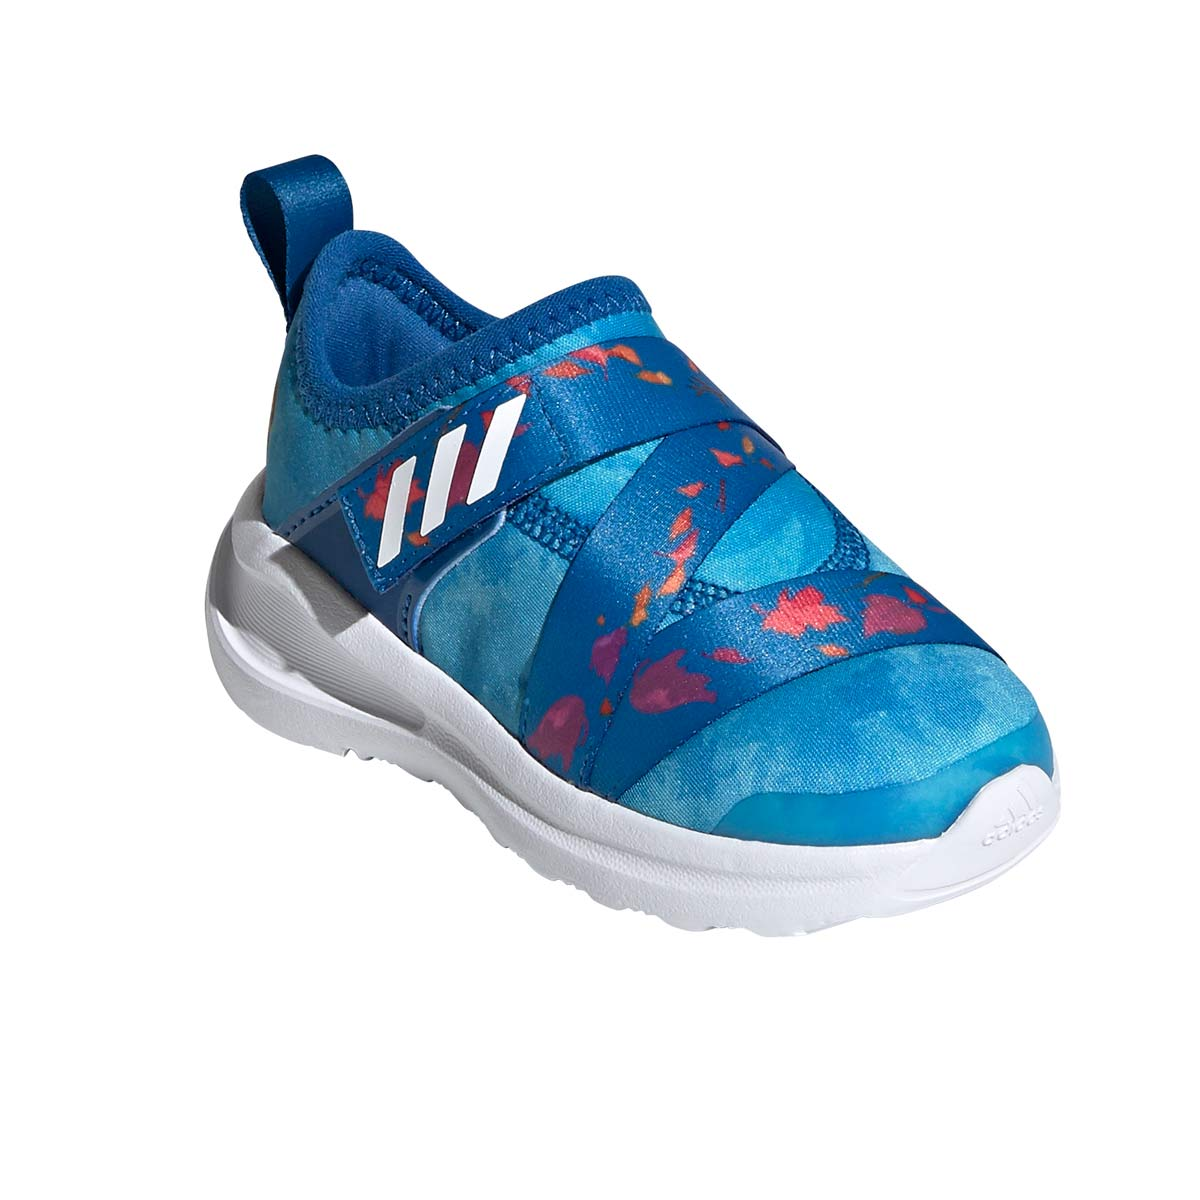 Tenis-Infantil-Adidas-FortaRun-X-Frozen-C---18-ao-25-